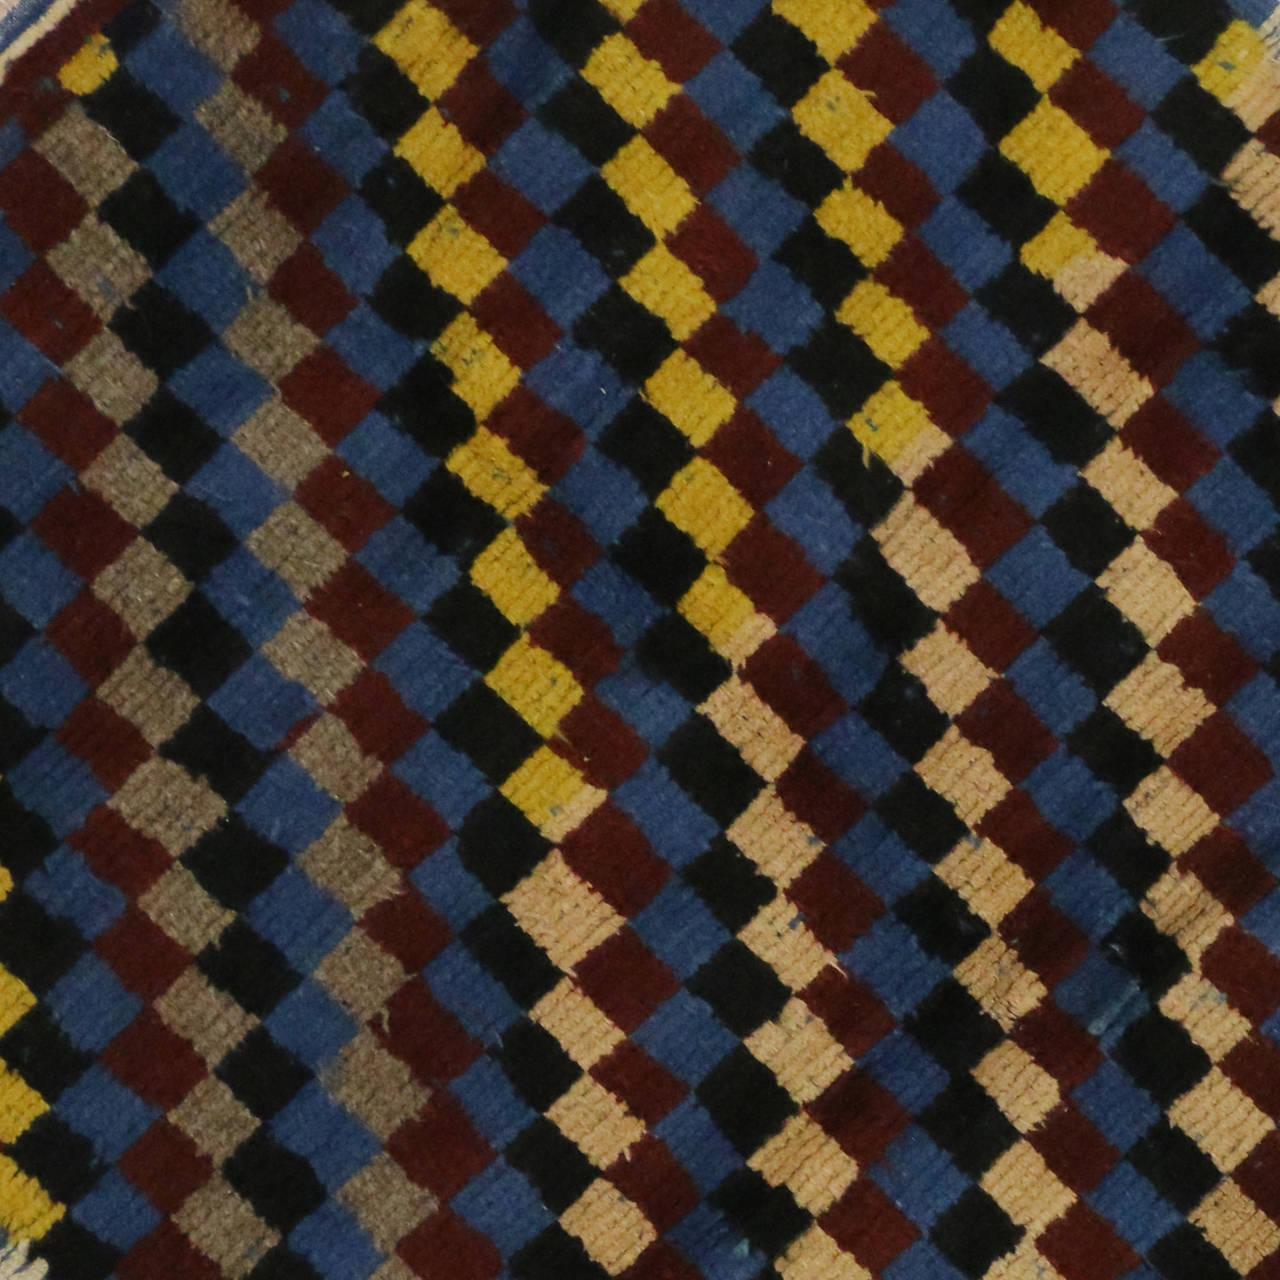 Checkerboard Rug: Vintage Turkish Tulu Checkerboard Pattern Rug With Mid